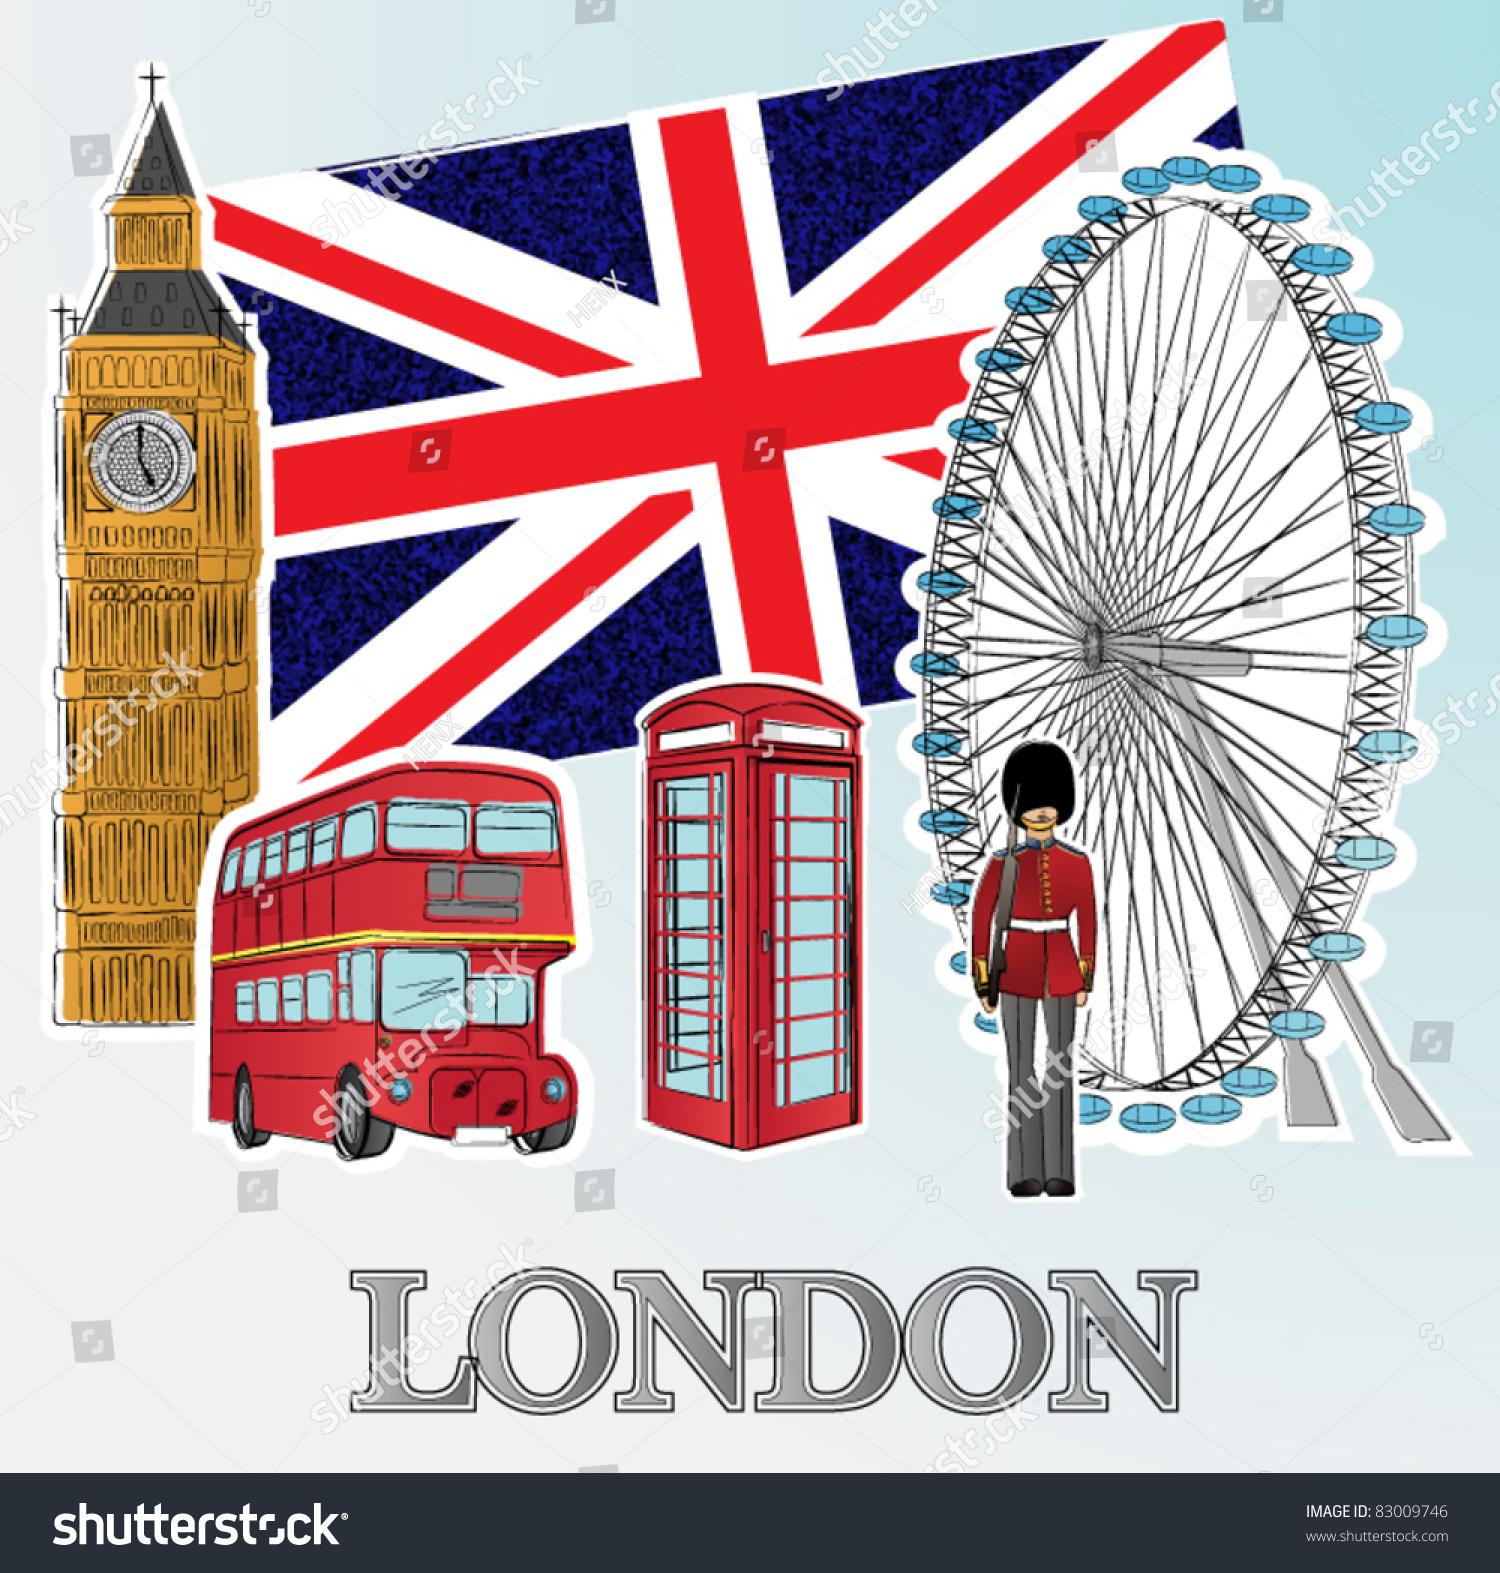 London Clip Art : London stock vector shutterstock